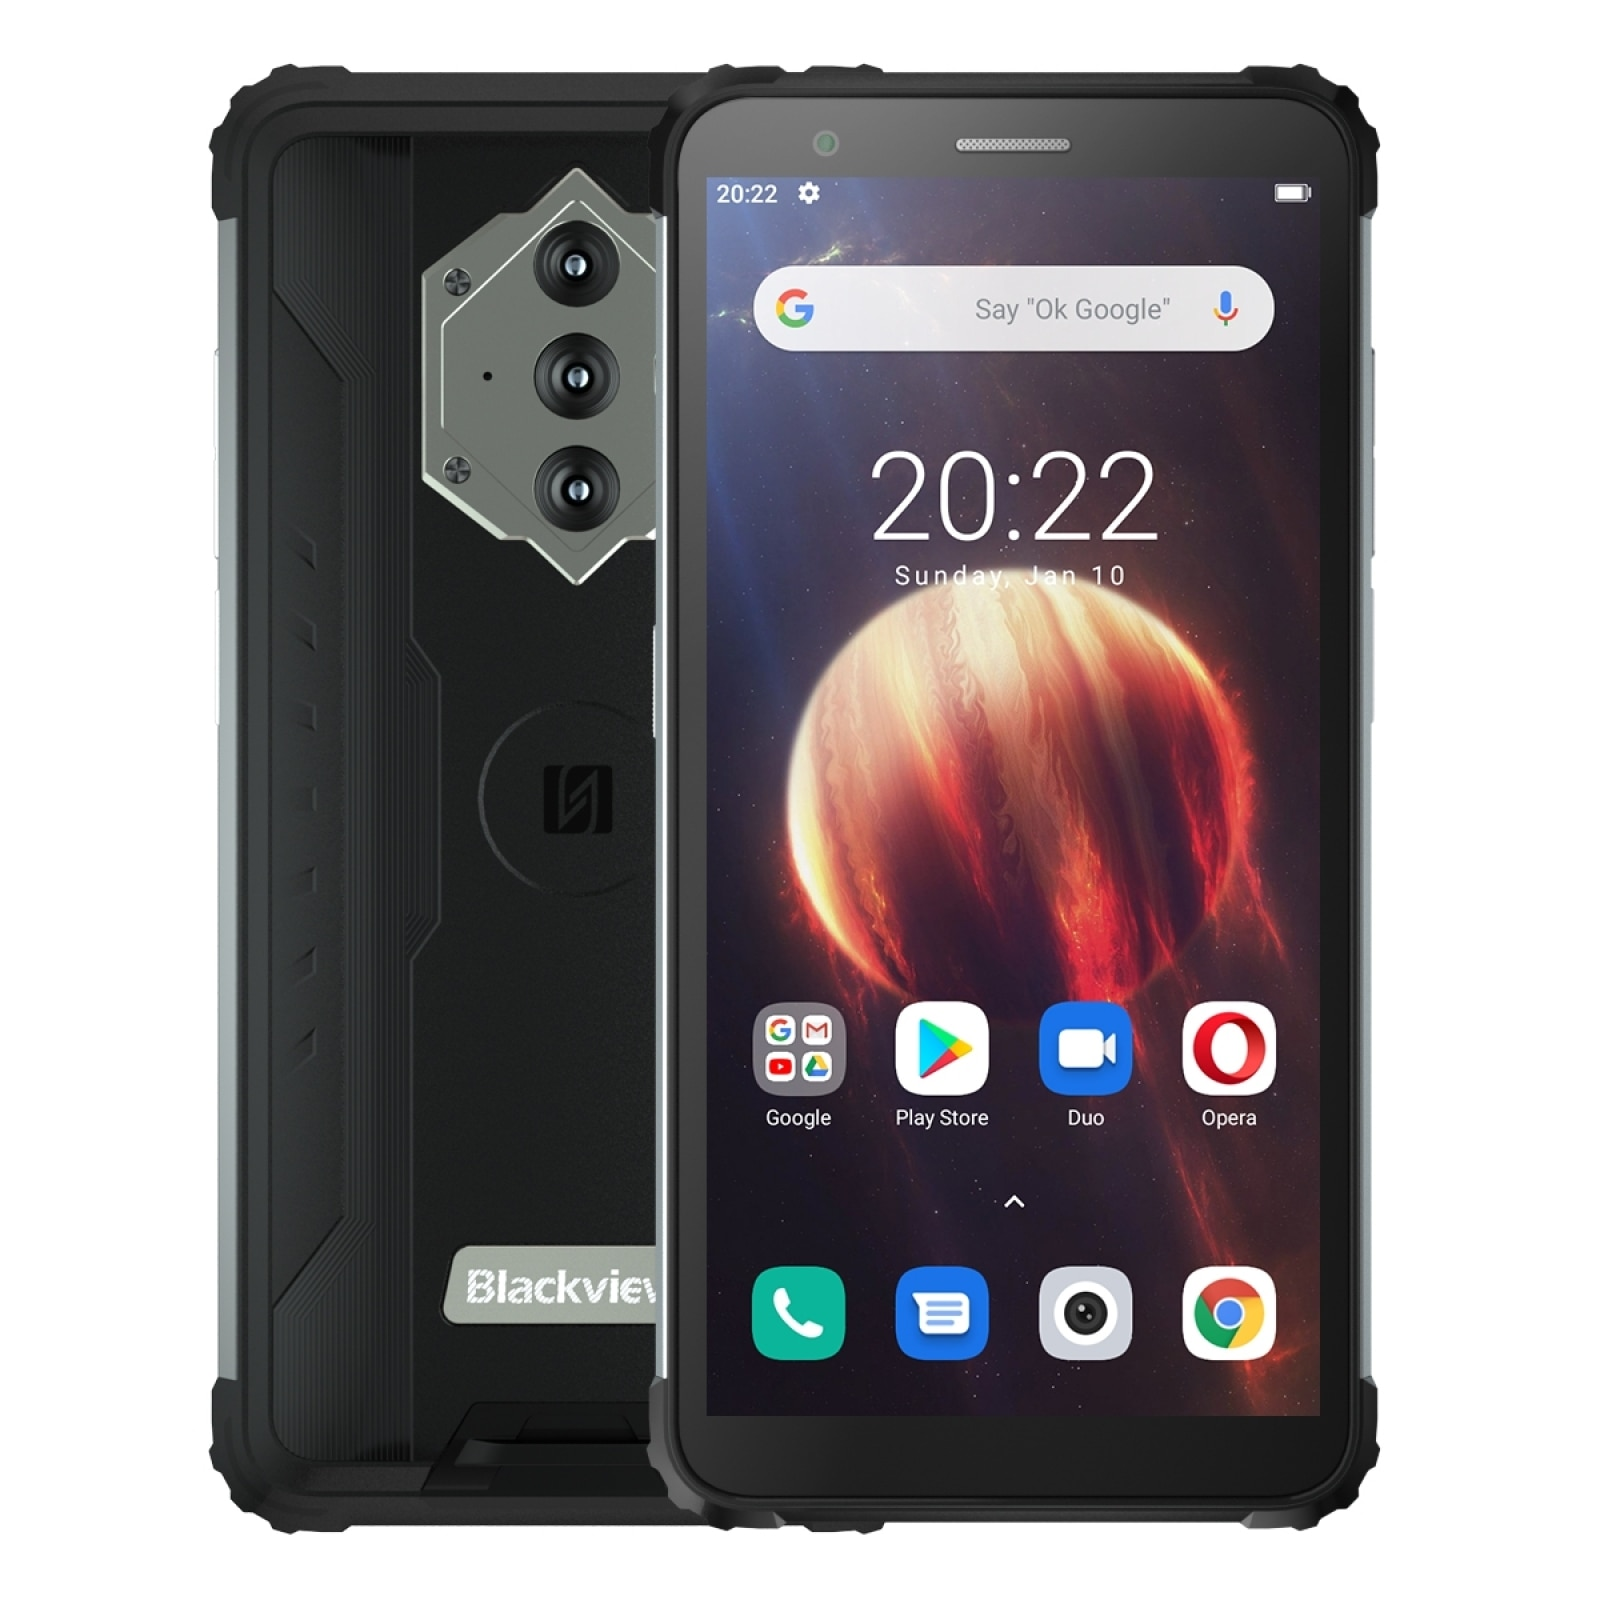 Blackview BV6600 IP68 прочный Водонепроницаемый смартфон 4 + 64 ГБ 5,7 дюйм Экран Helio A25 Octa Core Android 10 NFC 4G мобильный телефон 8580 мАч